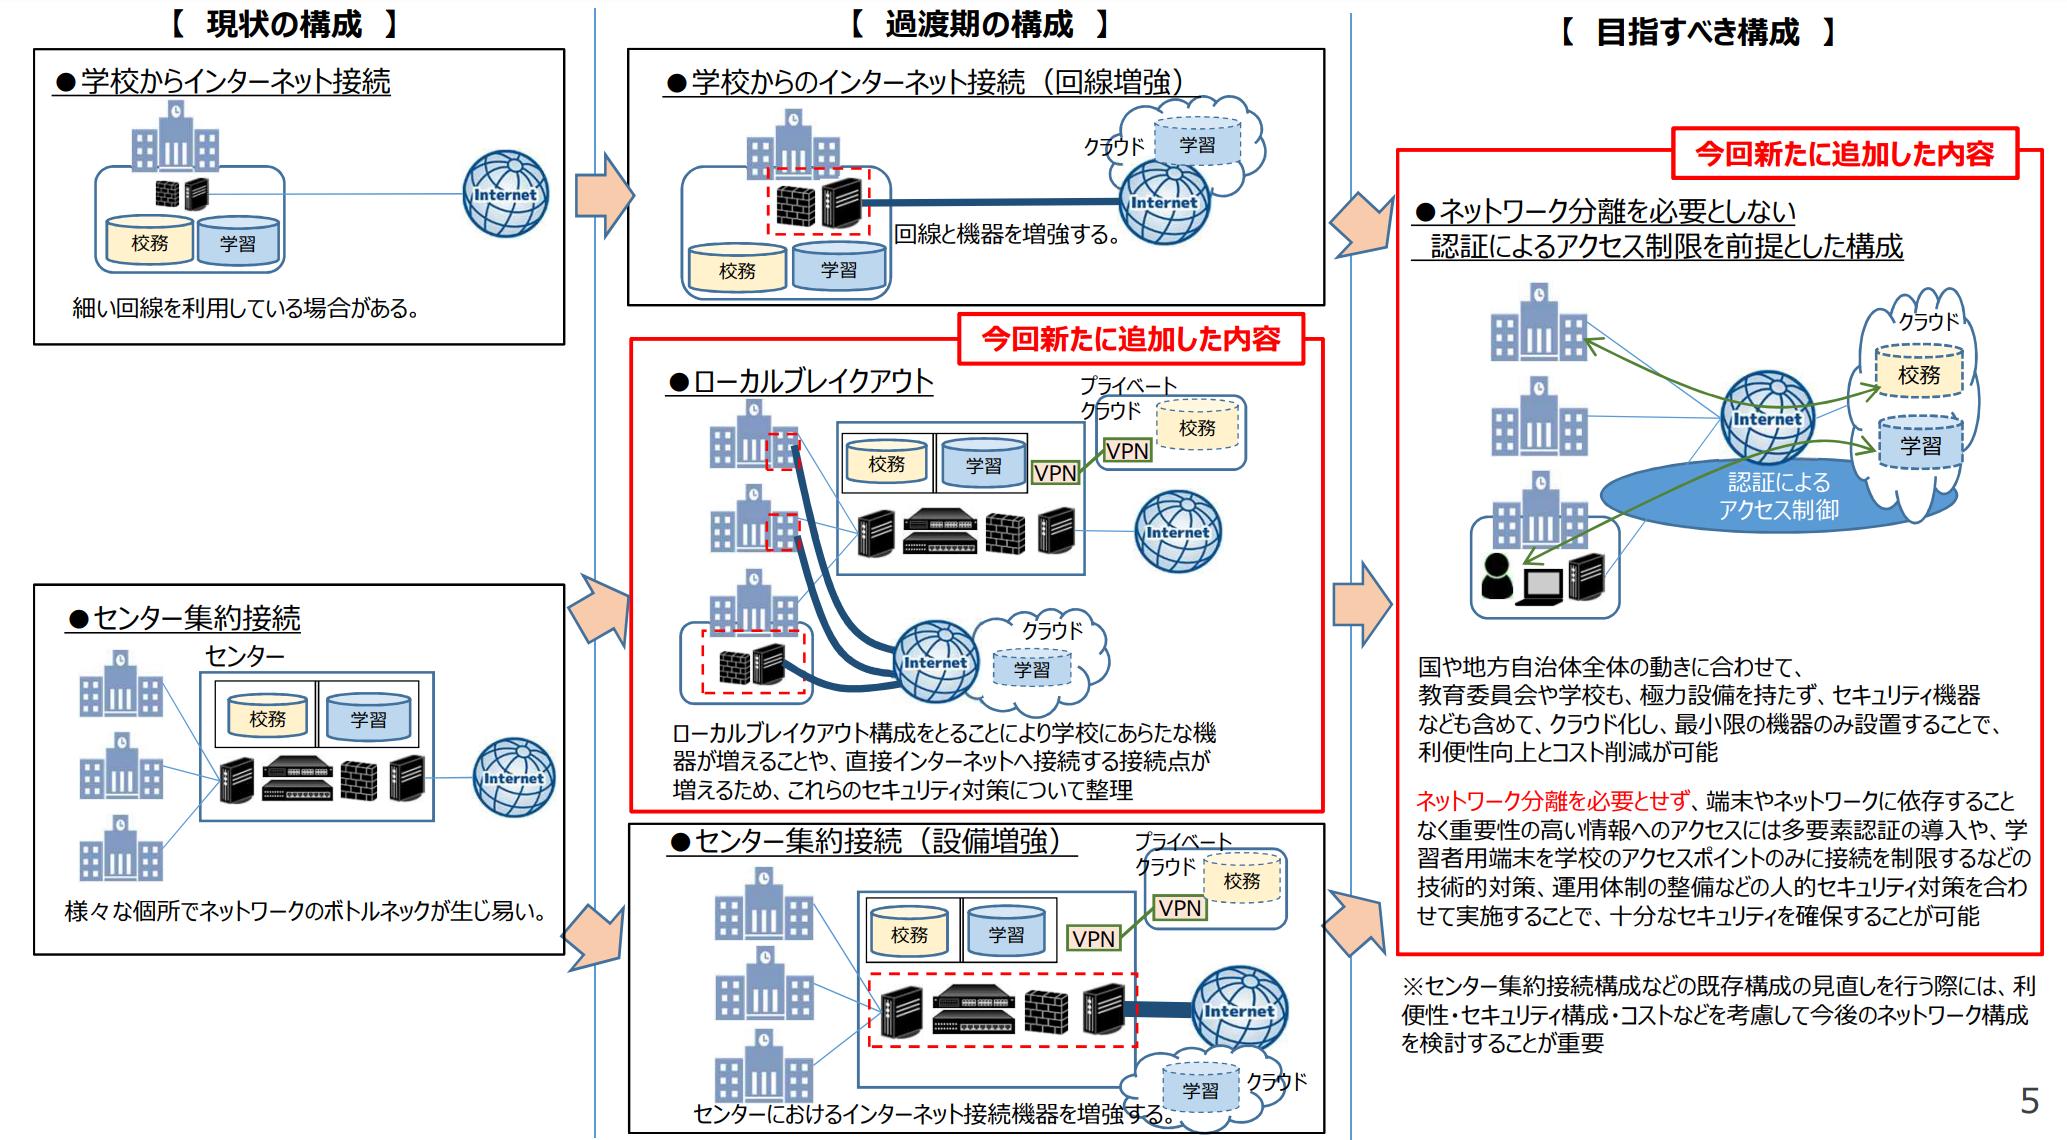 network_edu.png